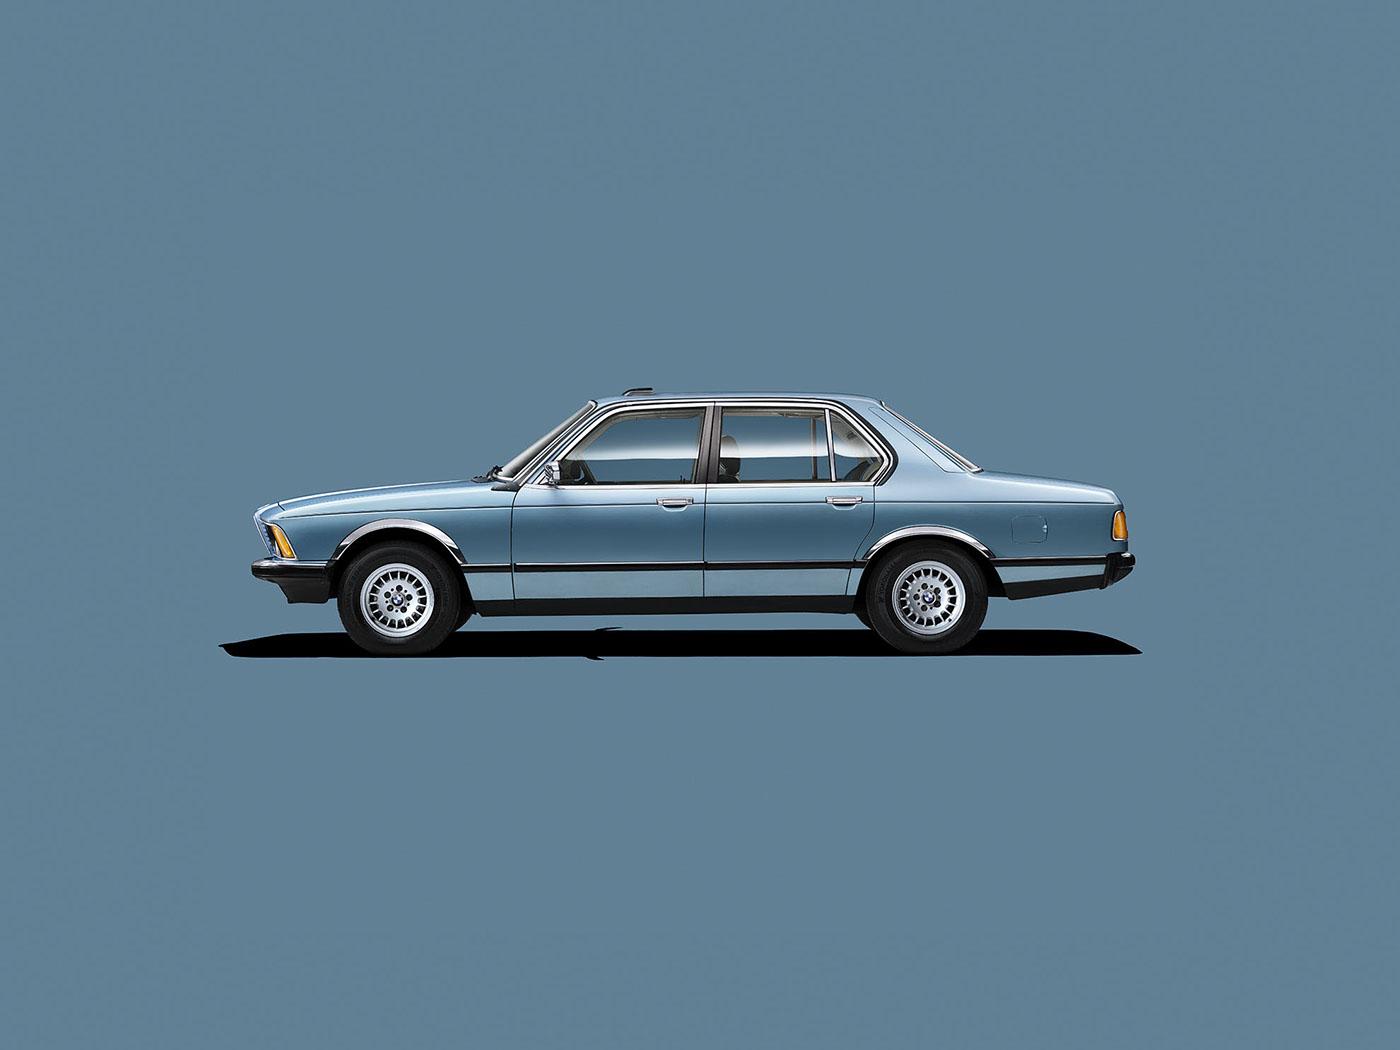 BMW Classic Cars Calendar on Behance